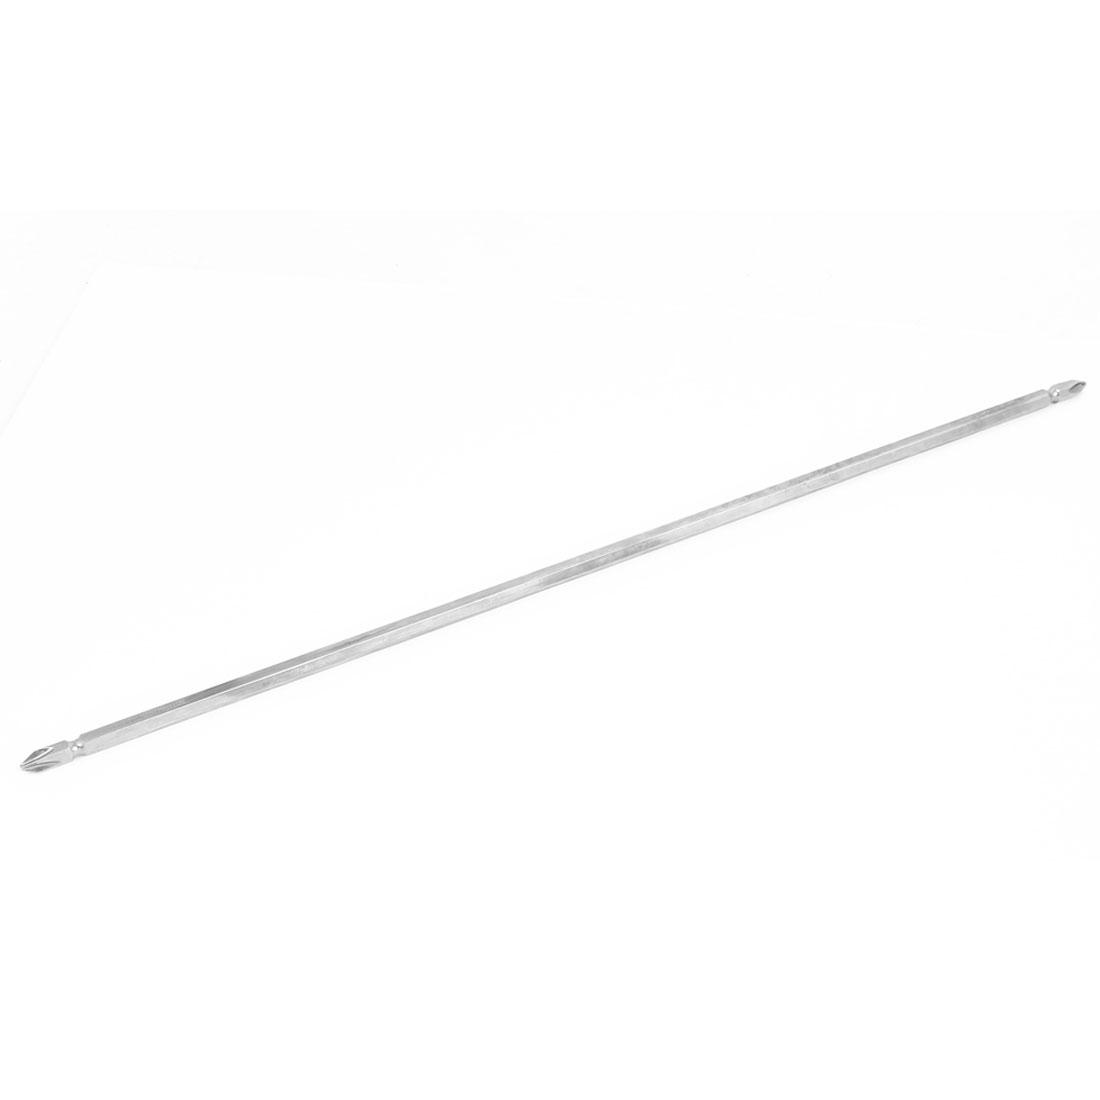 Magnetic PH2 Double End Phillips Screwdriver Bit Gray 40cm Length